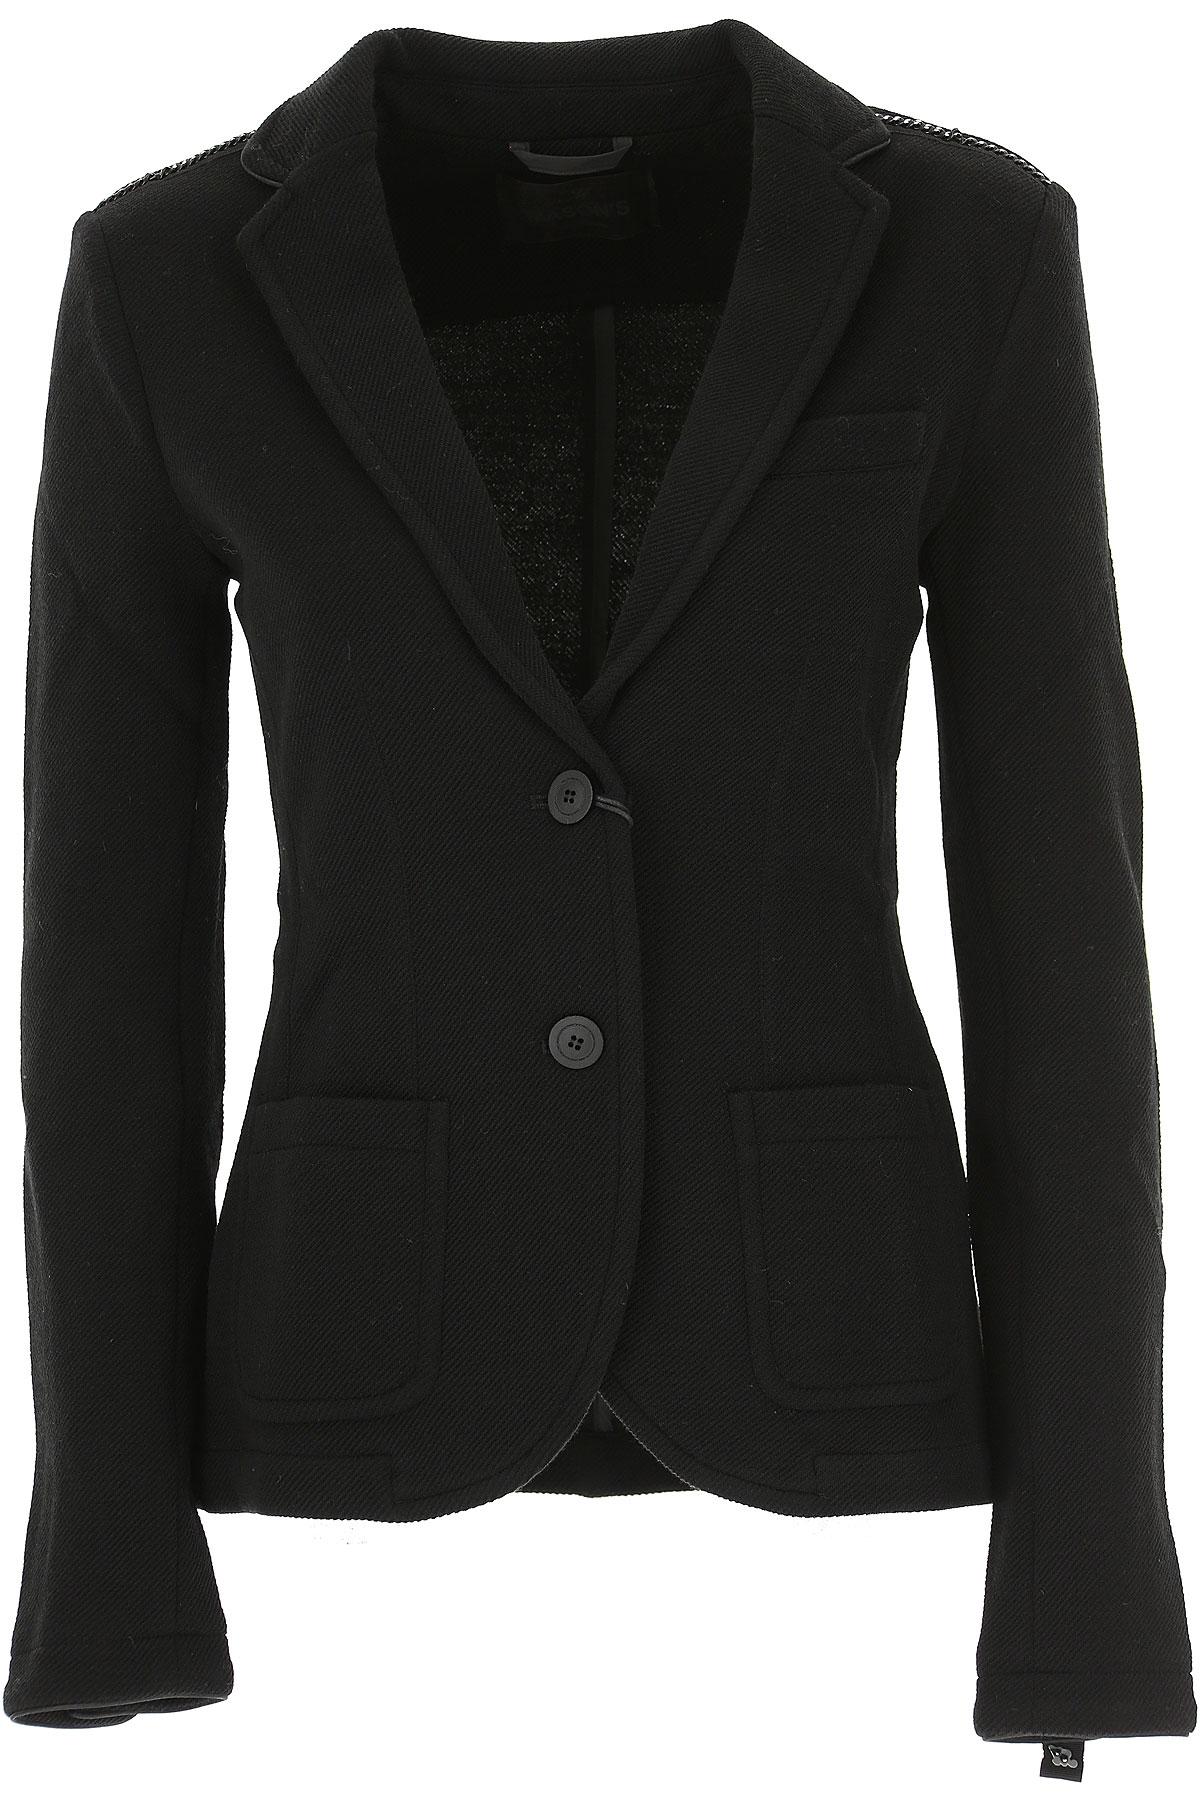 Image of Masons Blazer for Women, Black, Wool, 2017, 10 6 8